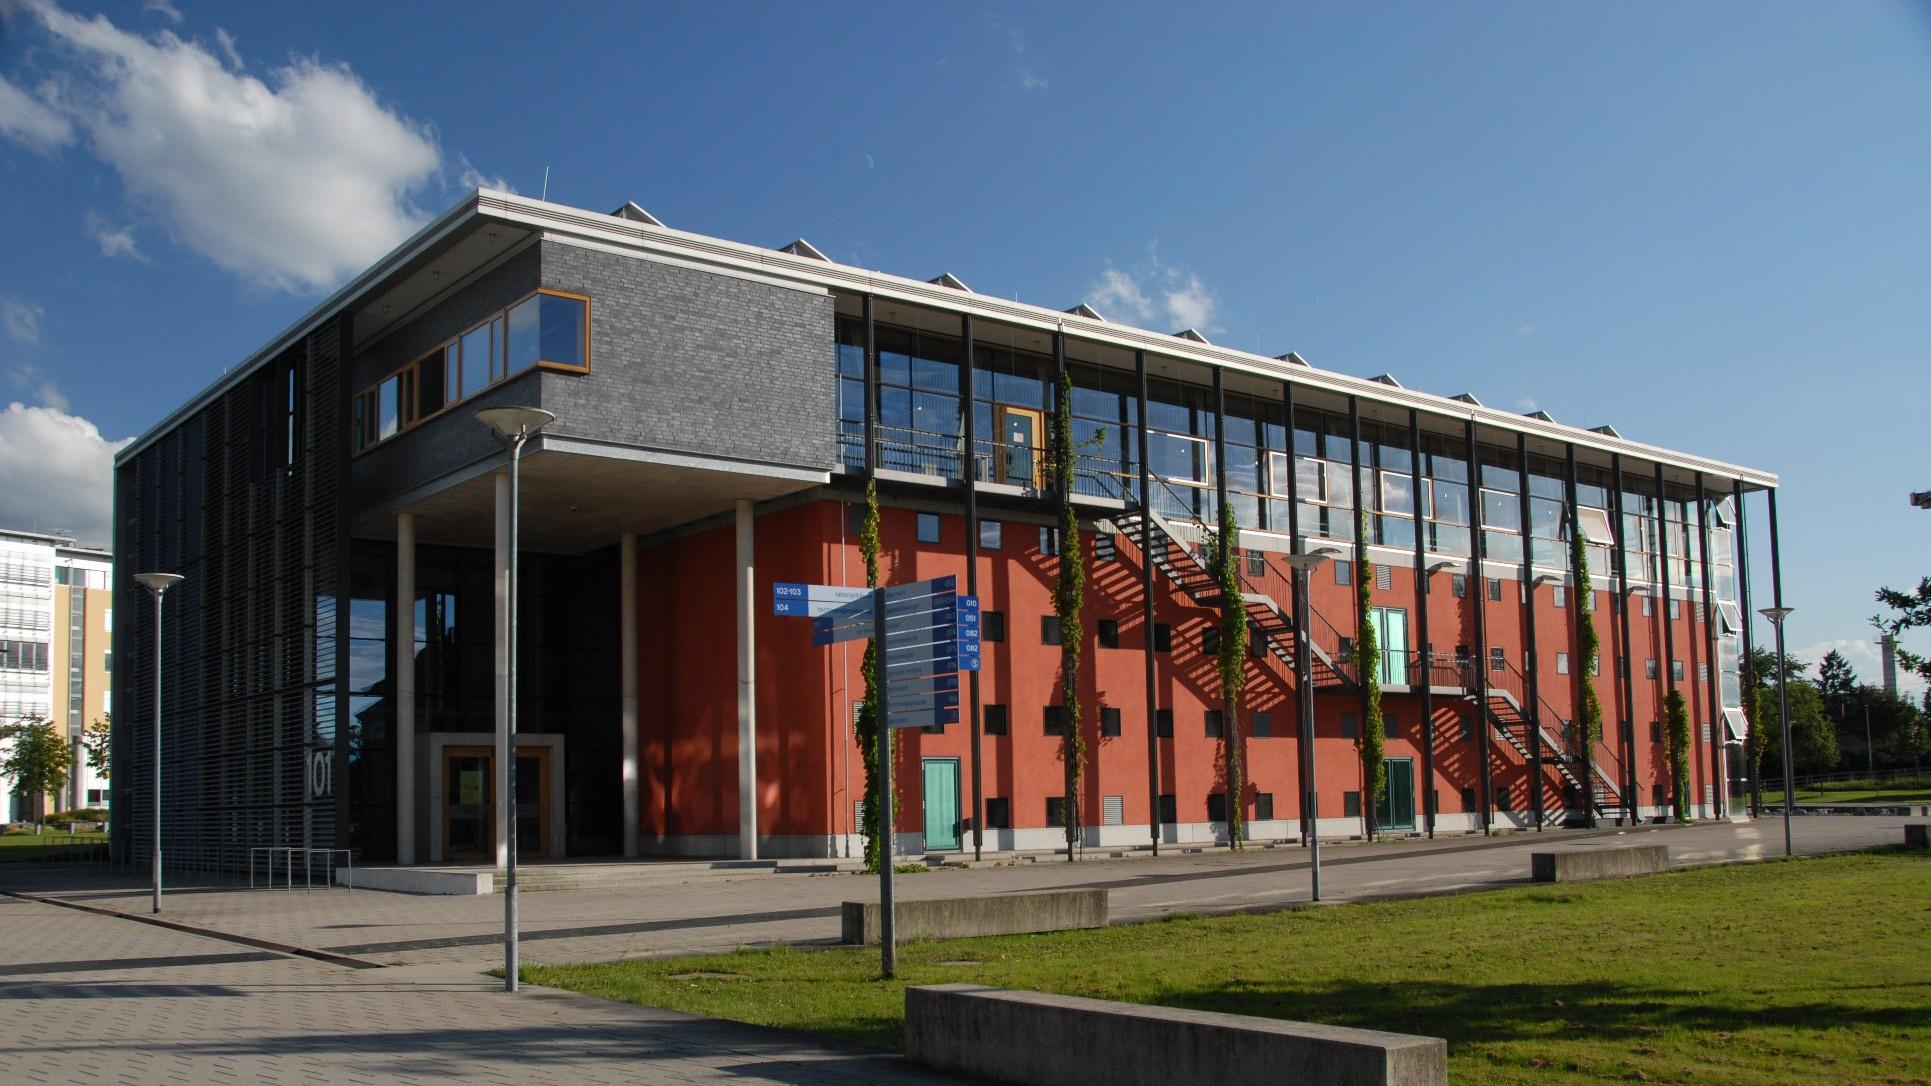 campus-16x9-dsc-0115-a.jpg